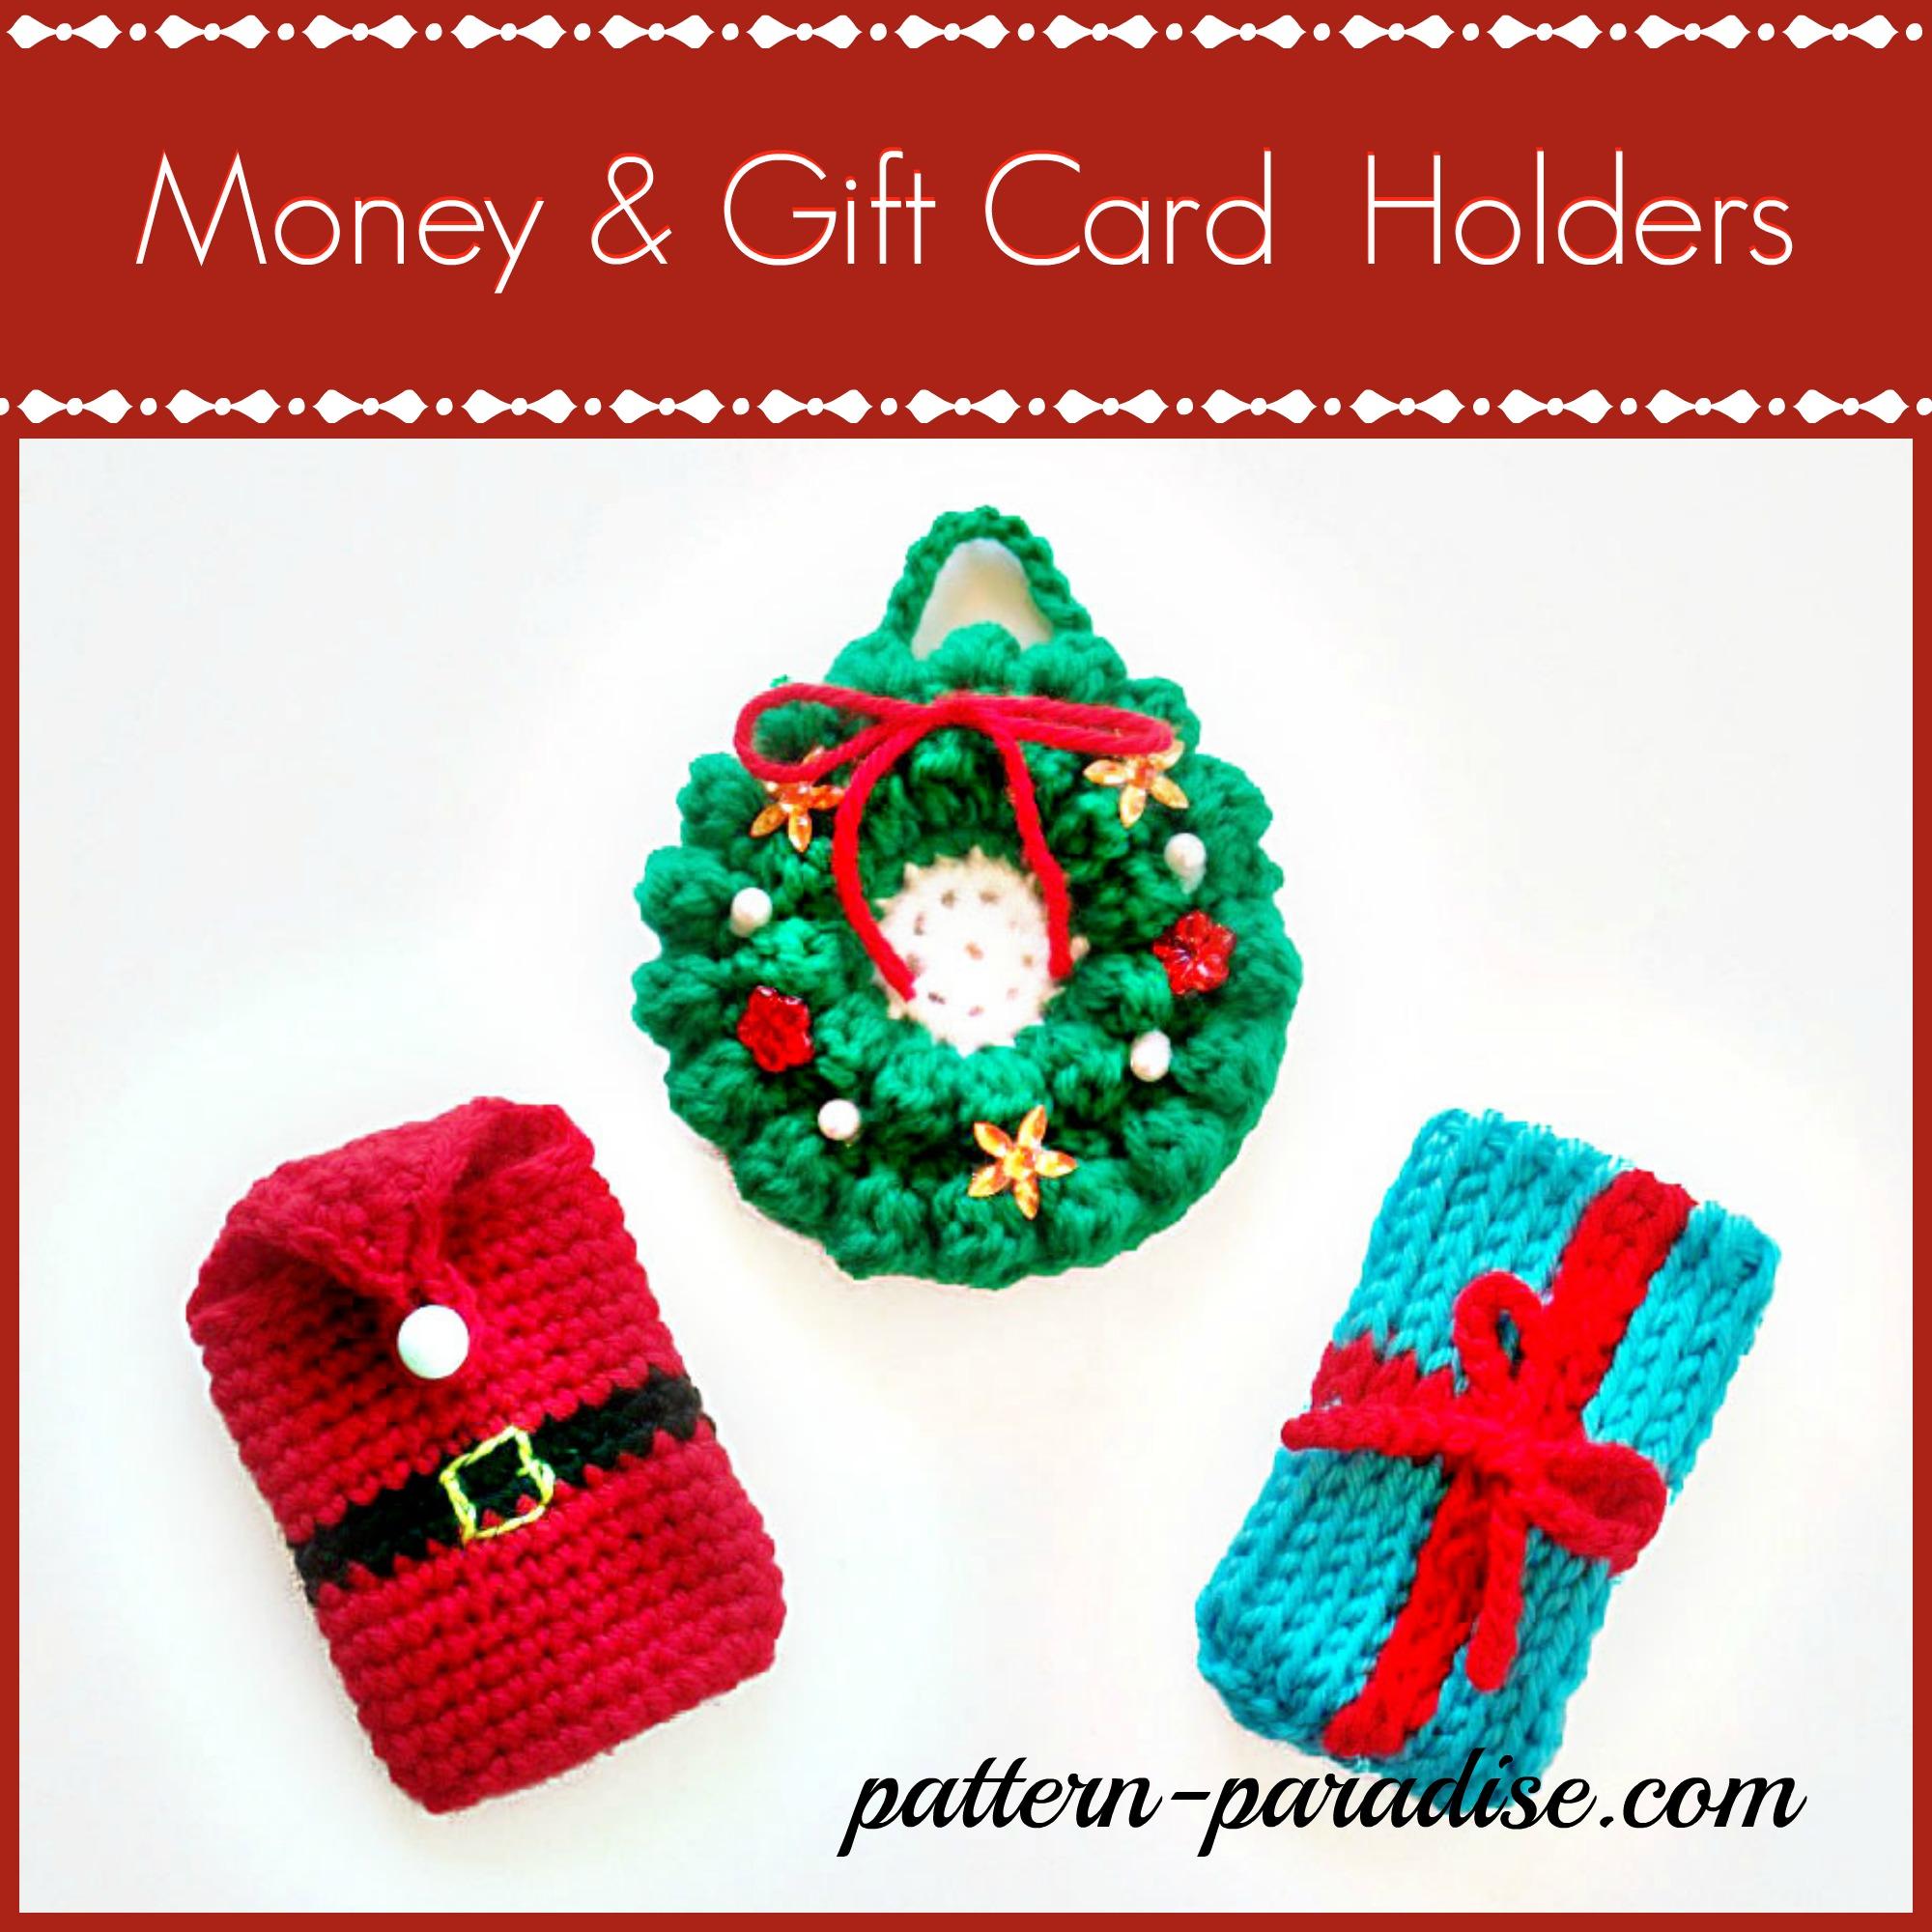 Free Crochet Pattern: Money & Gift Card Holders Pattern Paradise